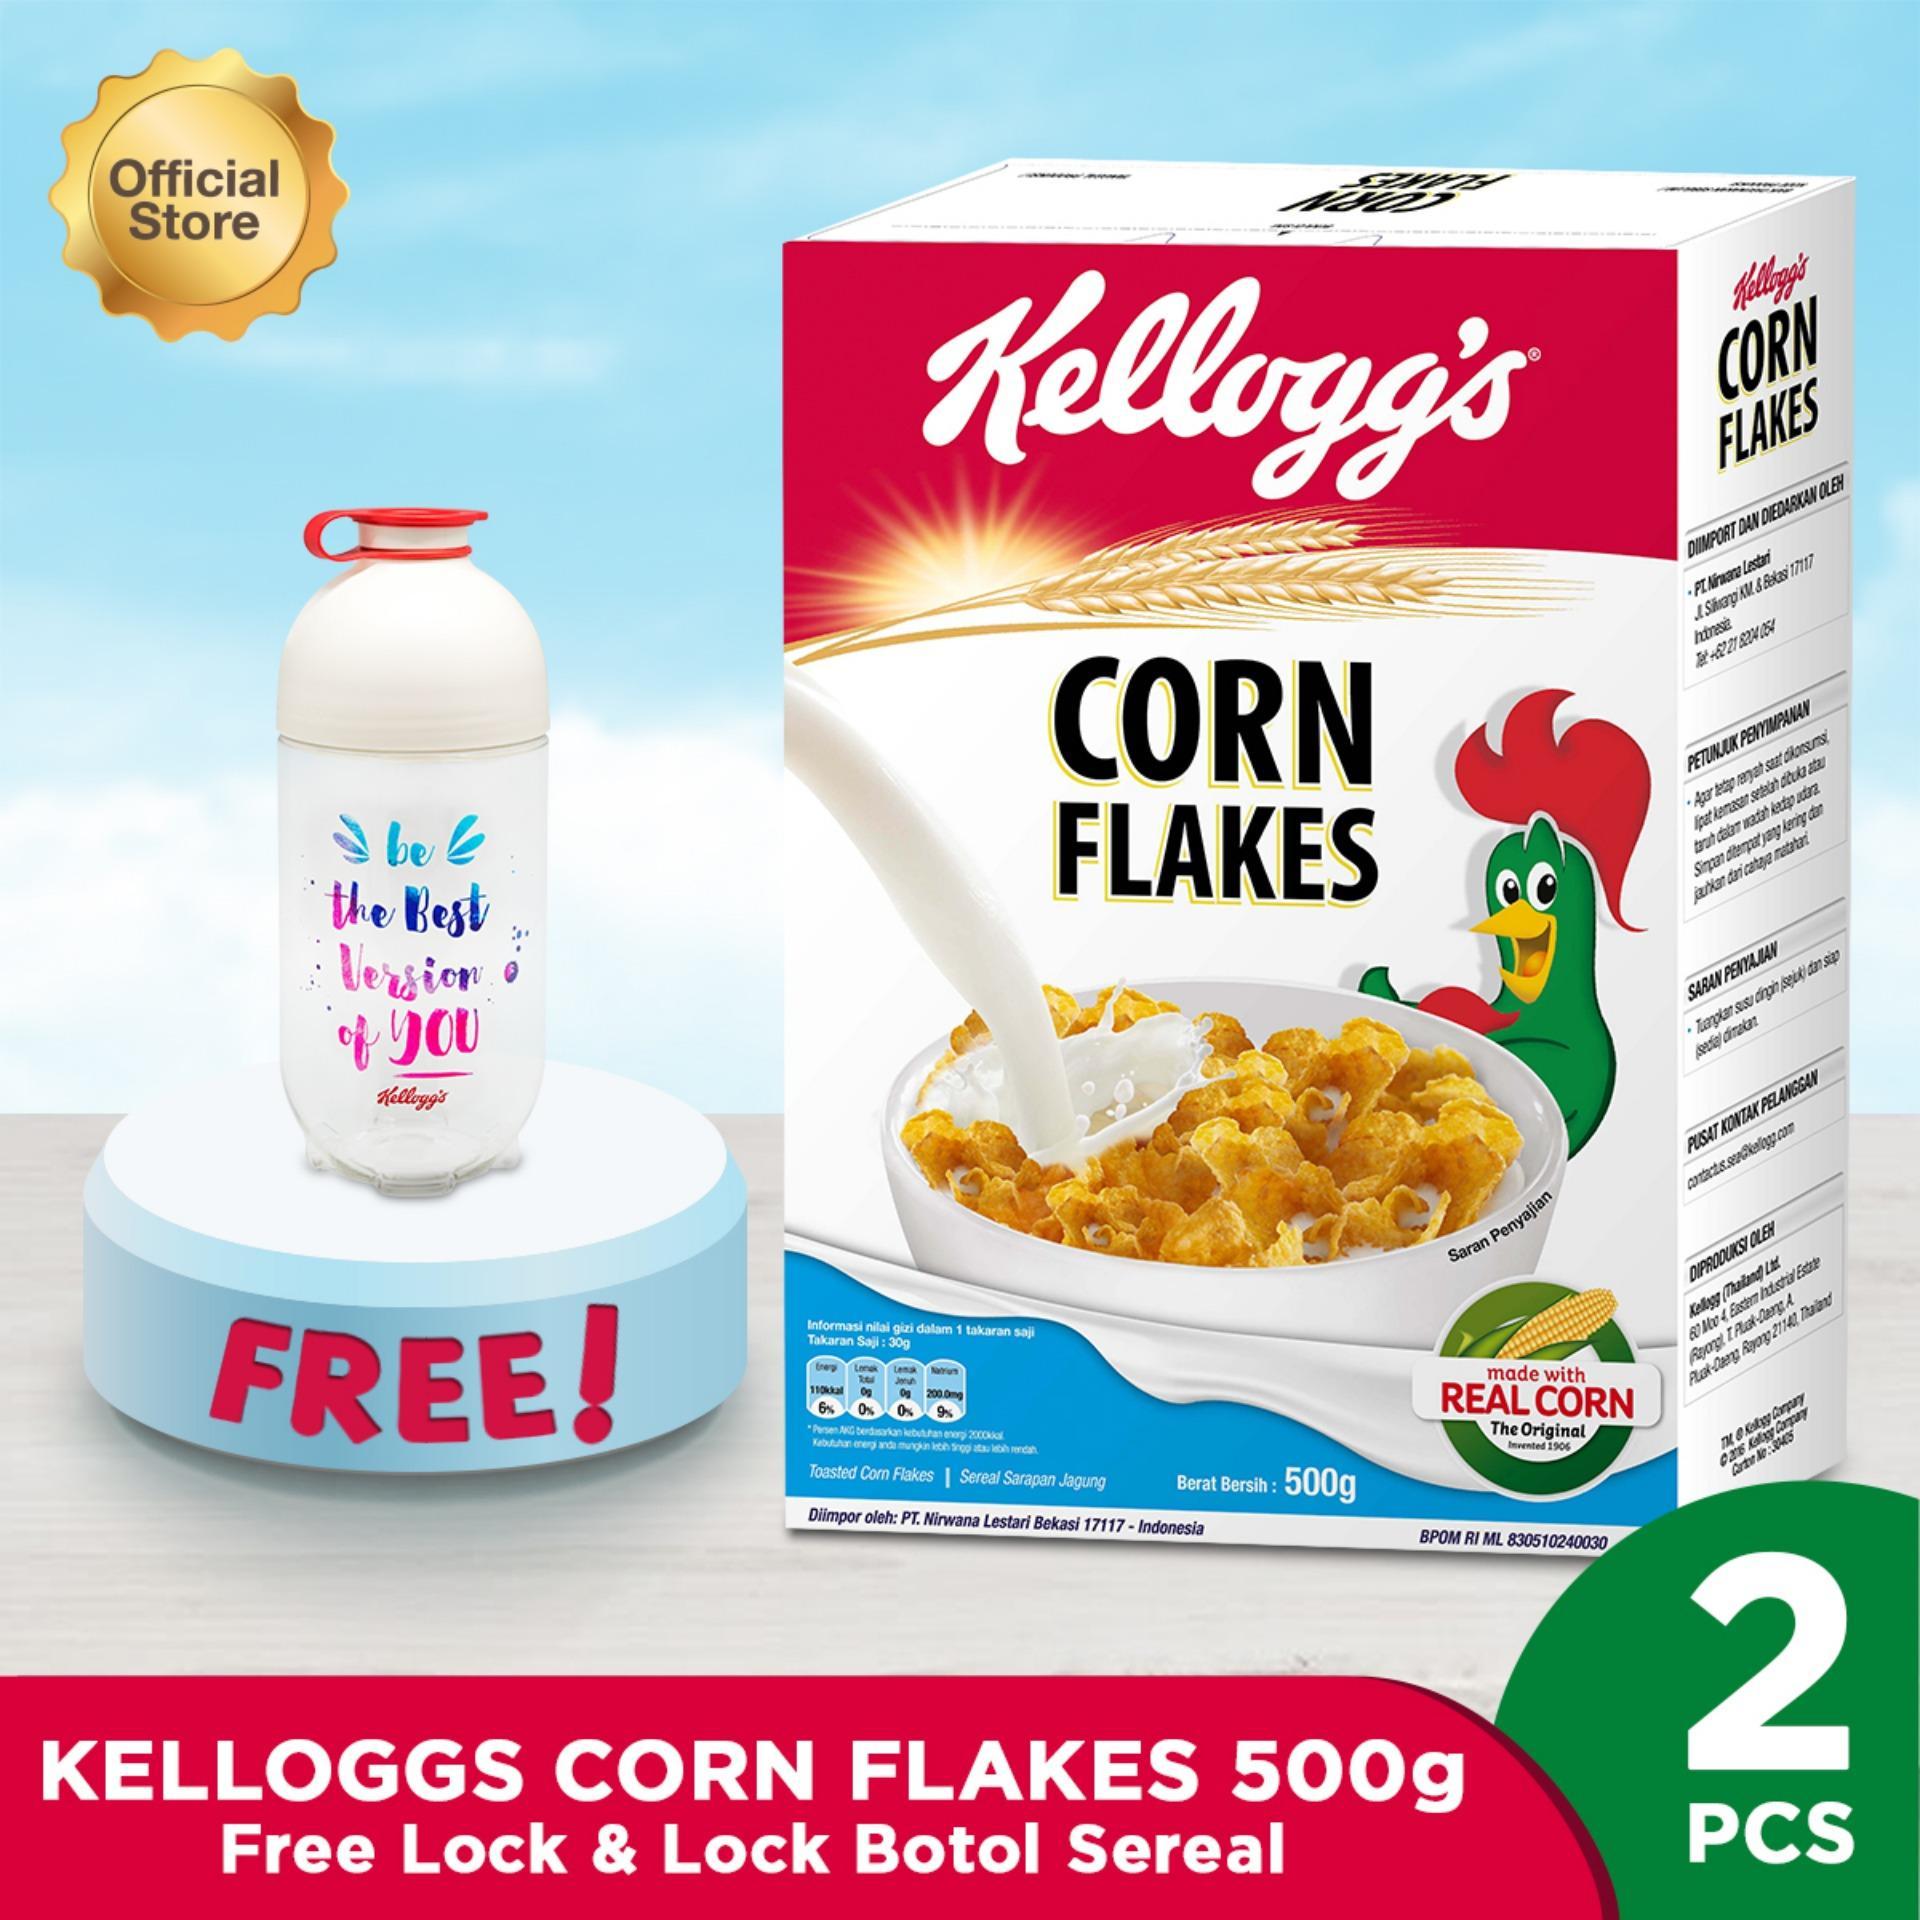 Sereal Lazada Paket 3 Pcs Naraya Oat Choco Bermacam Rasa Kelloggs Corn Flakes 500gr Free Lock Botol